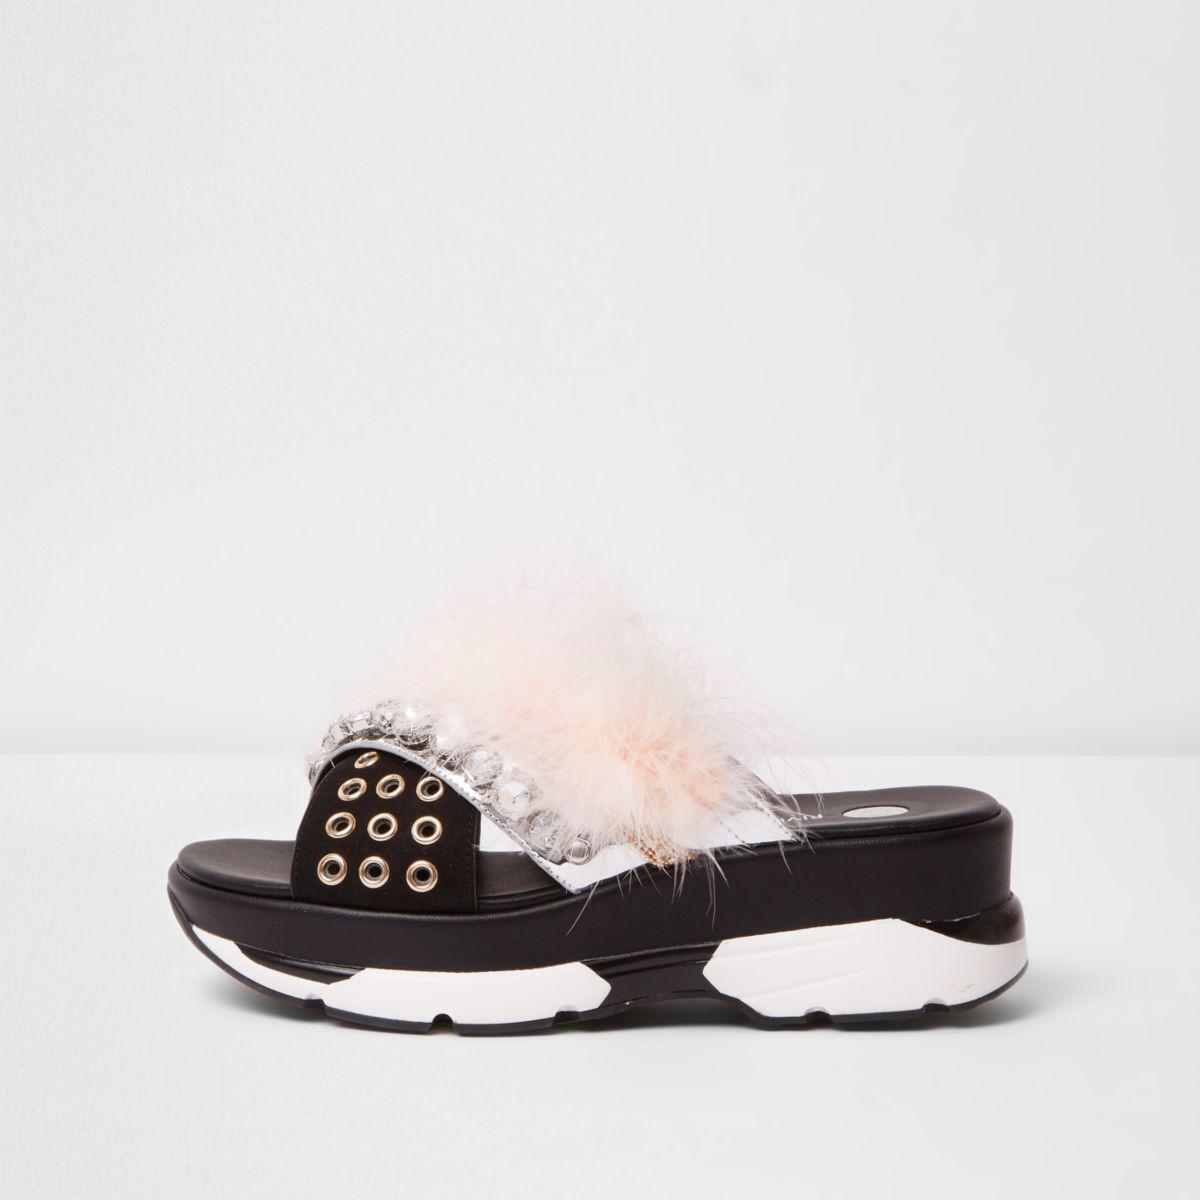 c3384754b03b Lyst - River Island Nude Fluffy Embellished Sporty Sandals